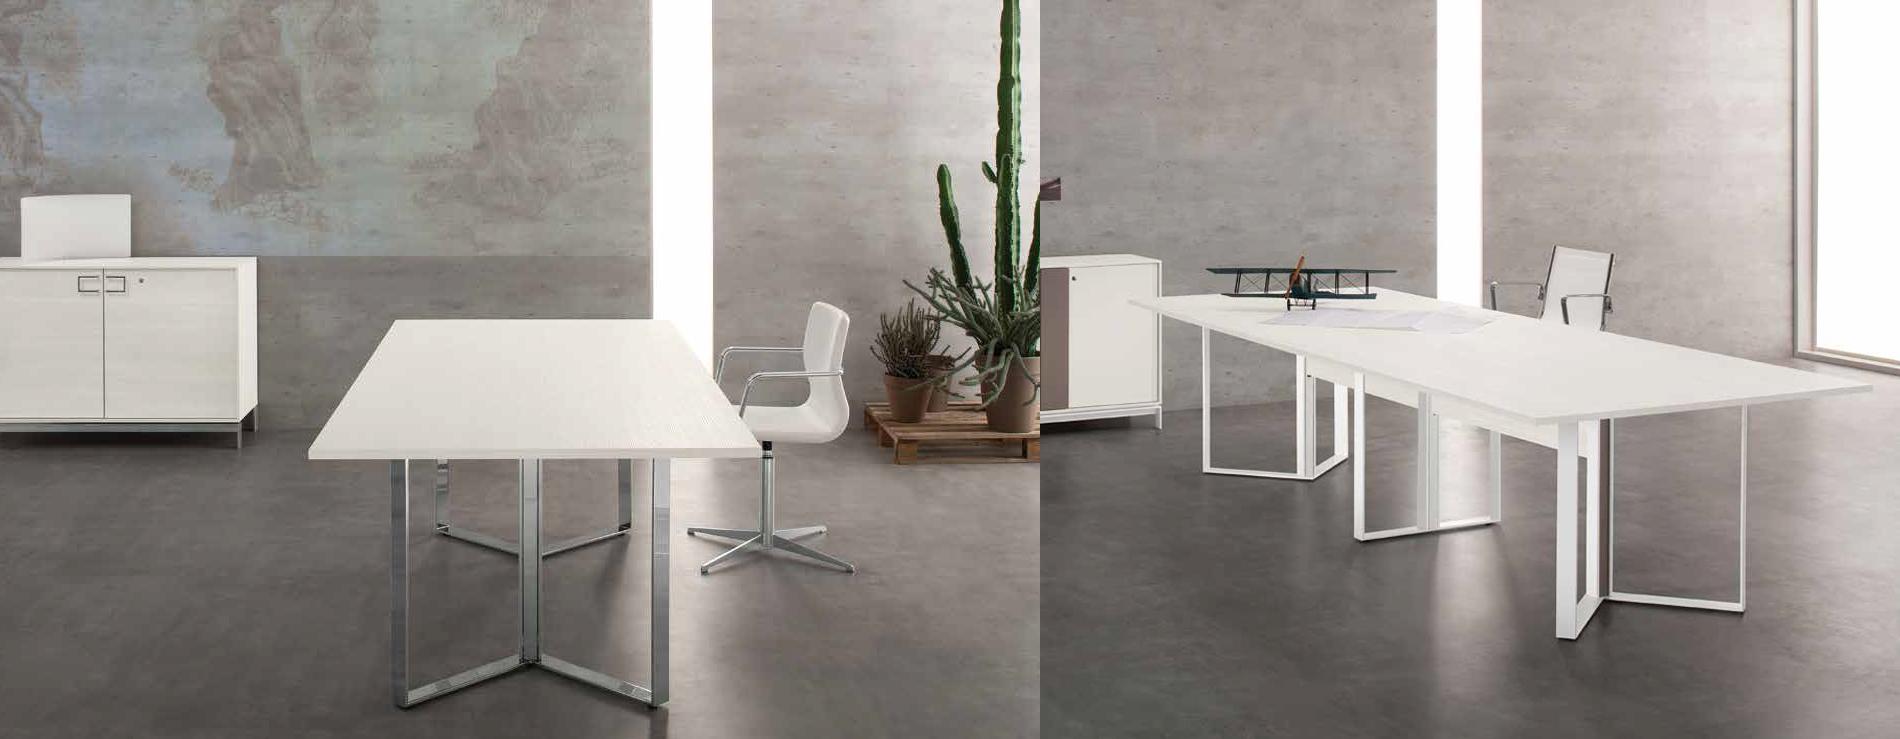 Tavolo sala riunioni sala riunioni with tavolo sala - Tavoli per ufficio ...